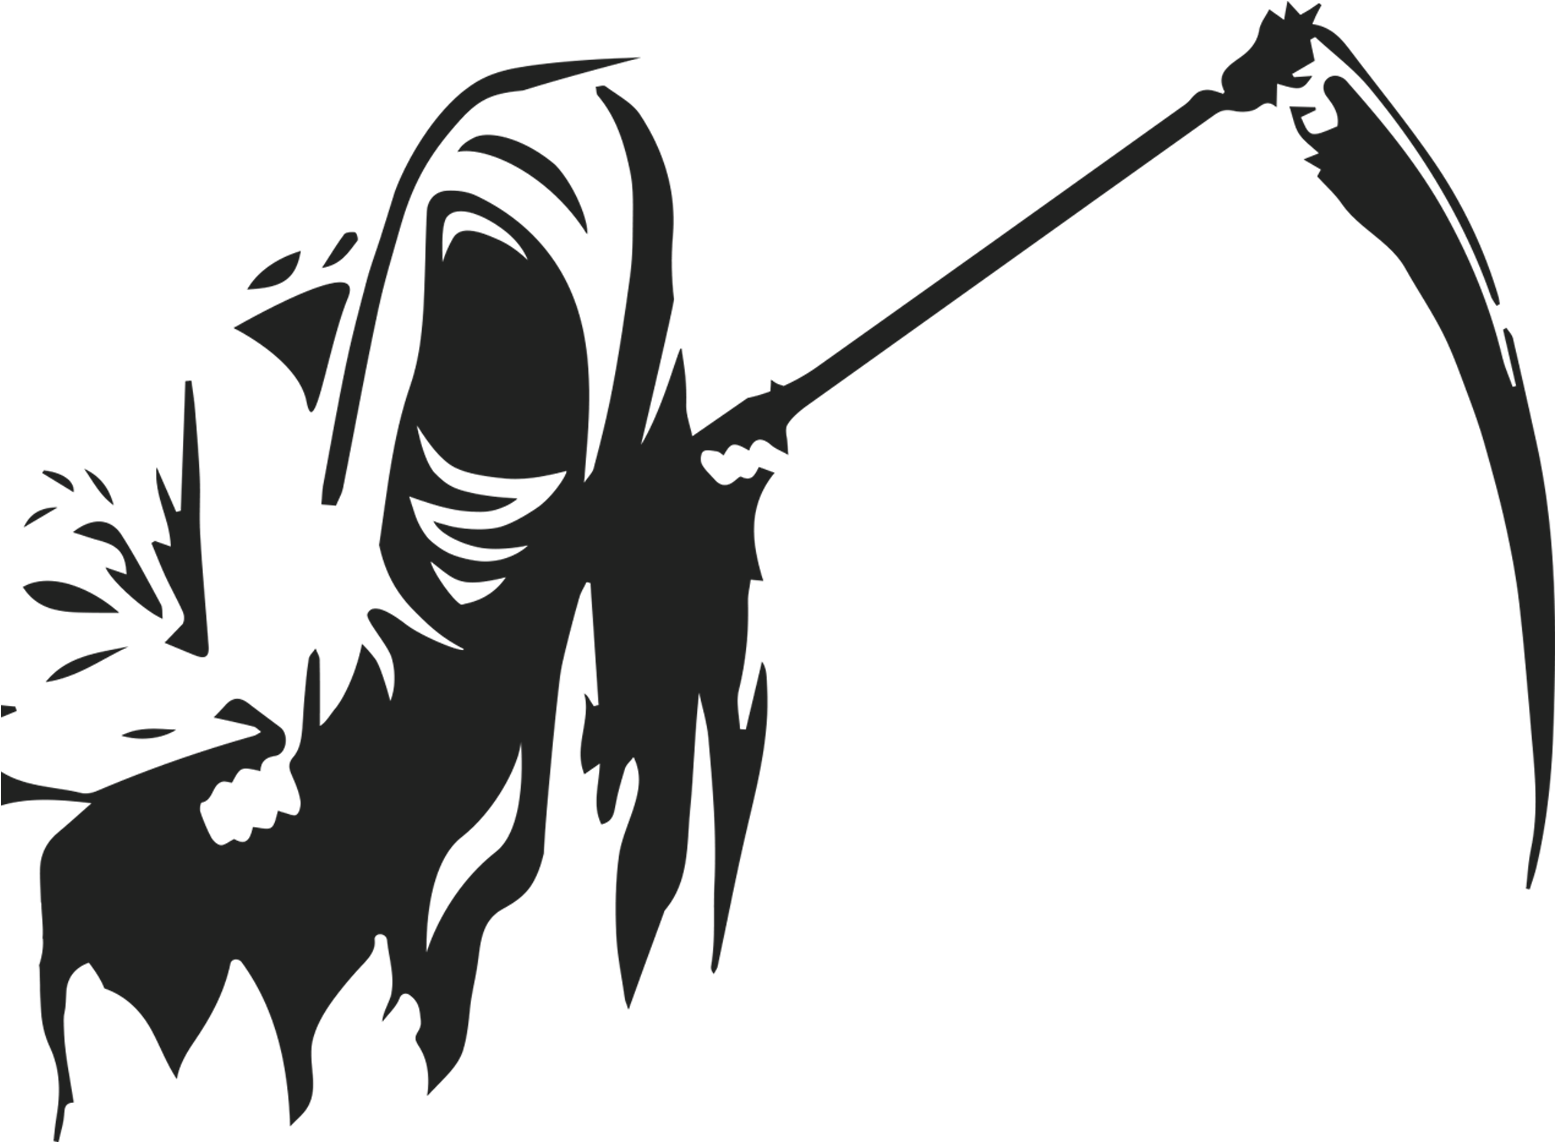 Download Death Logo Silhouette White - Reaper Black And ...